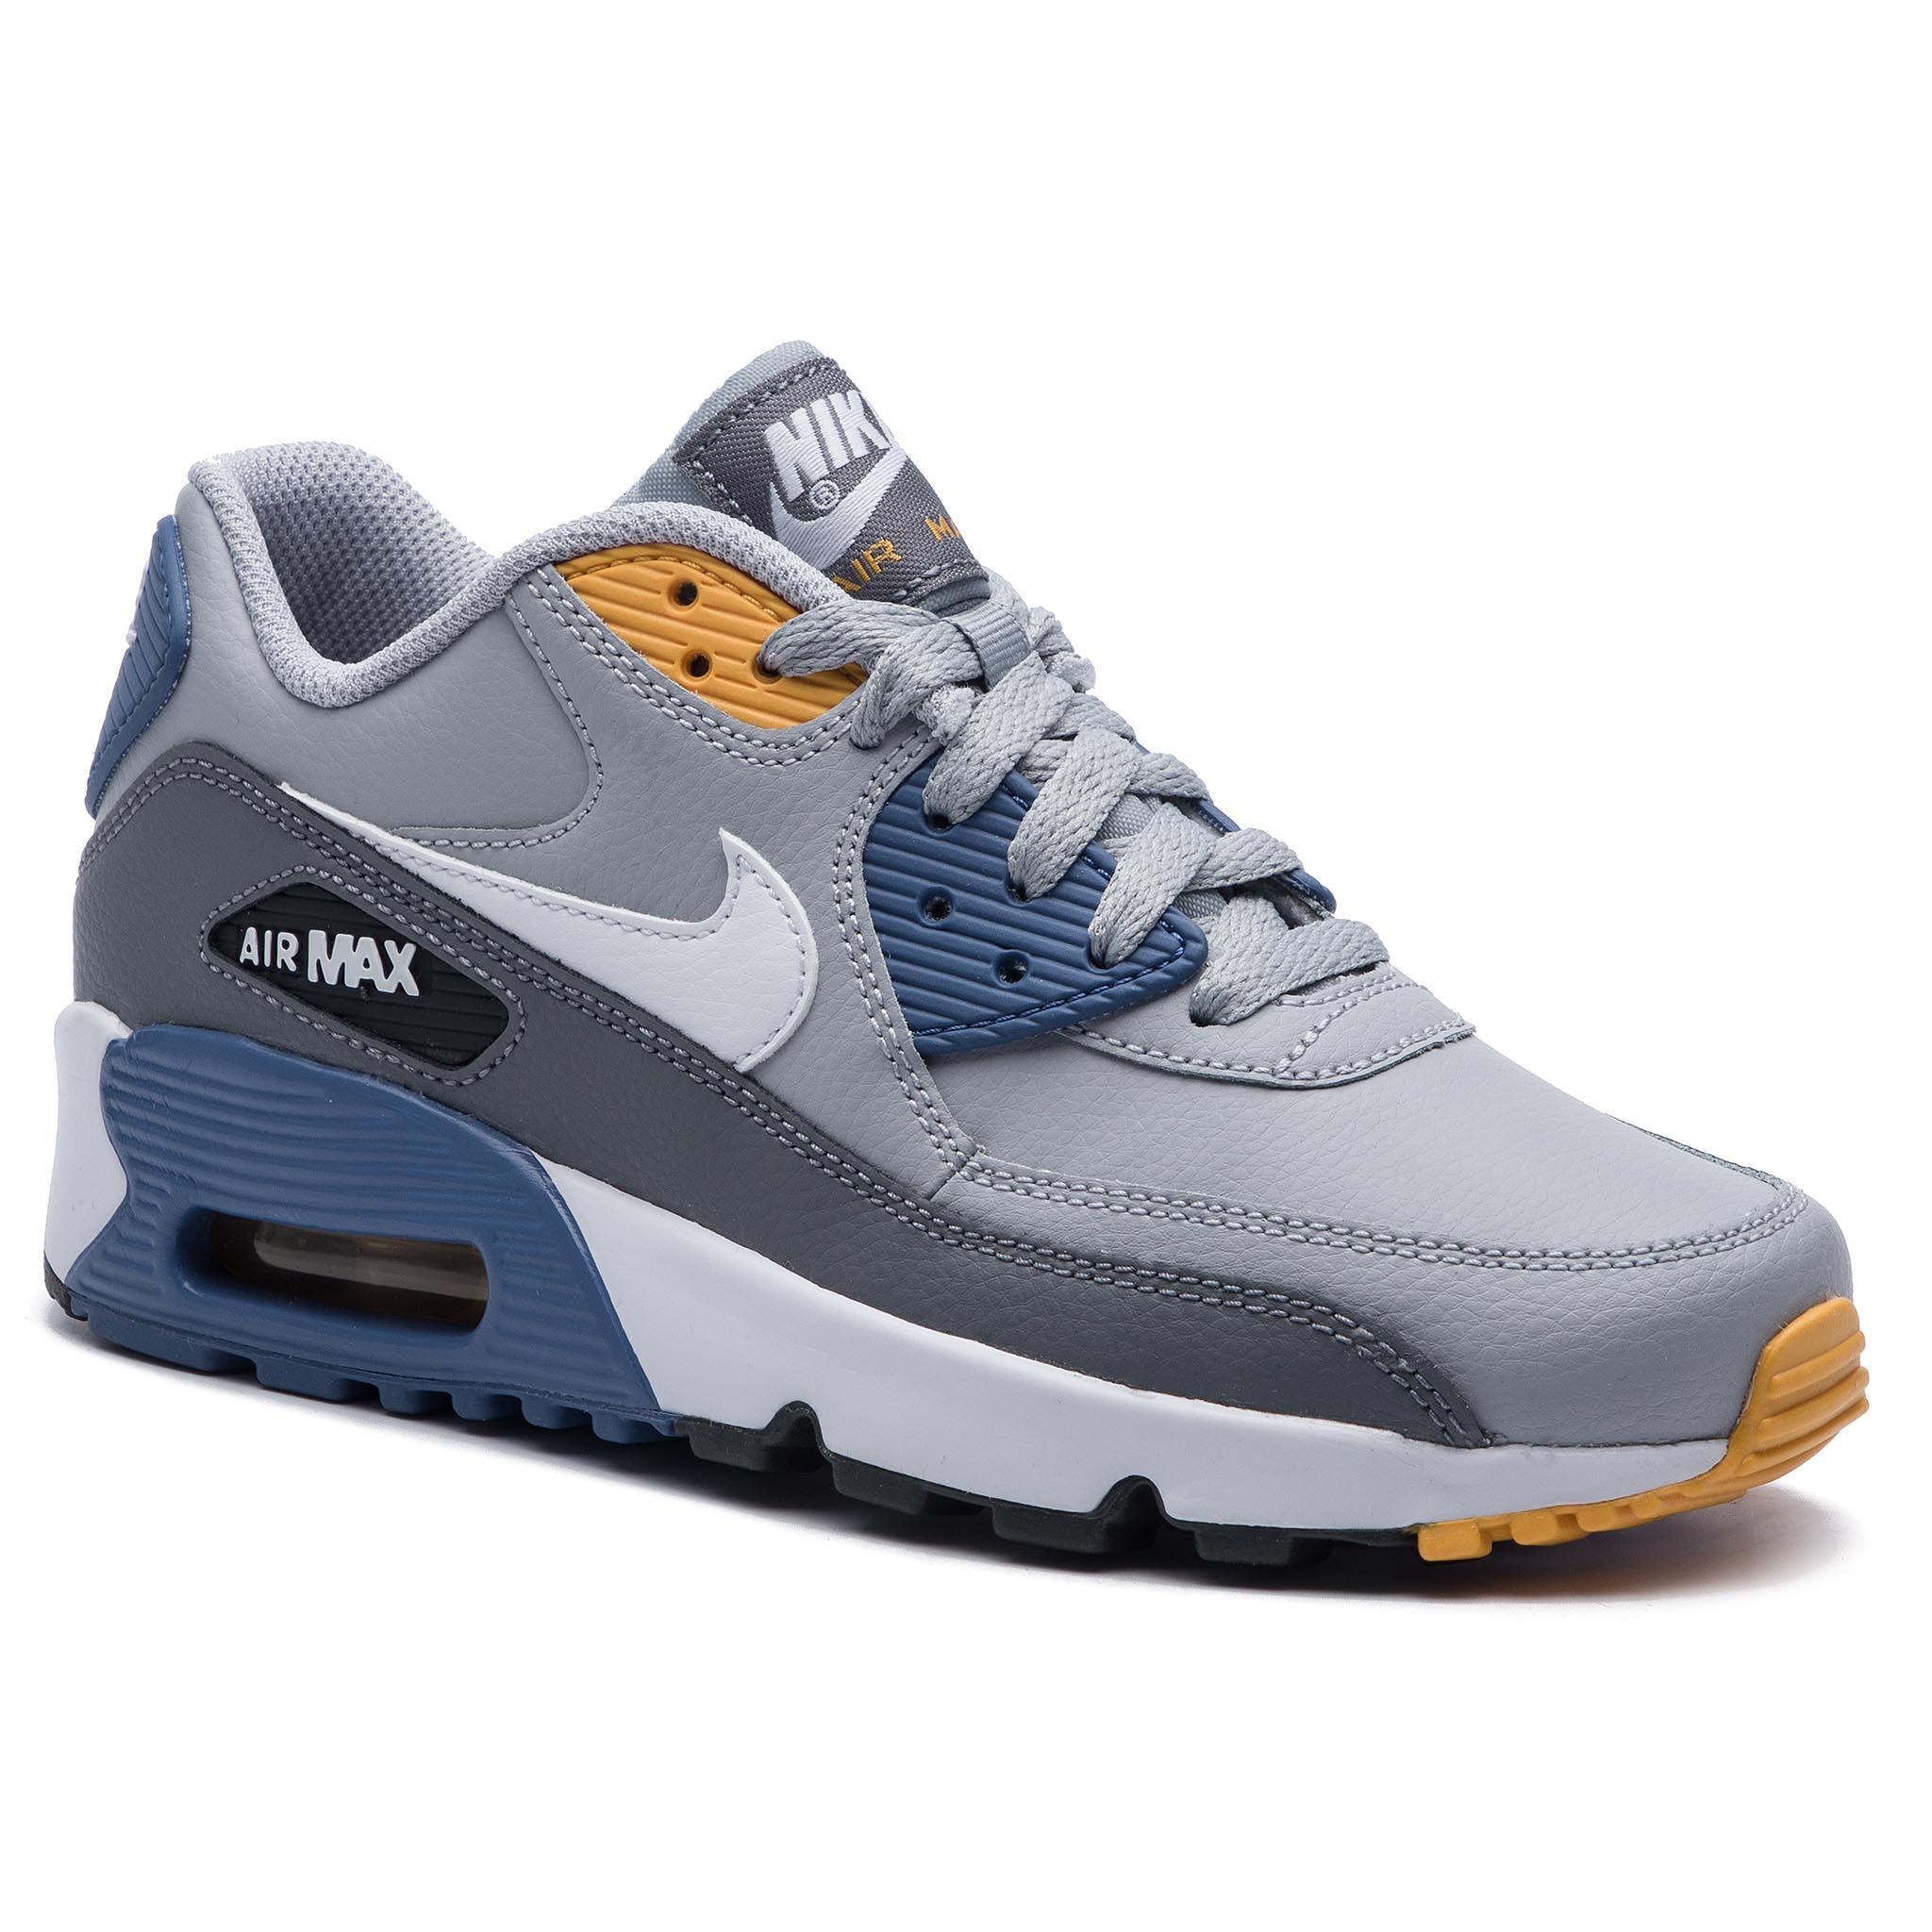 watch a0f24 a0130 Shoes NIKE Air Max 90Ltr (GS) 833412 026 Wolf Grey White Indigo Storm